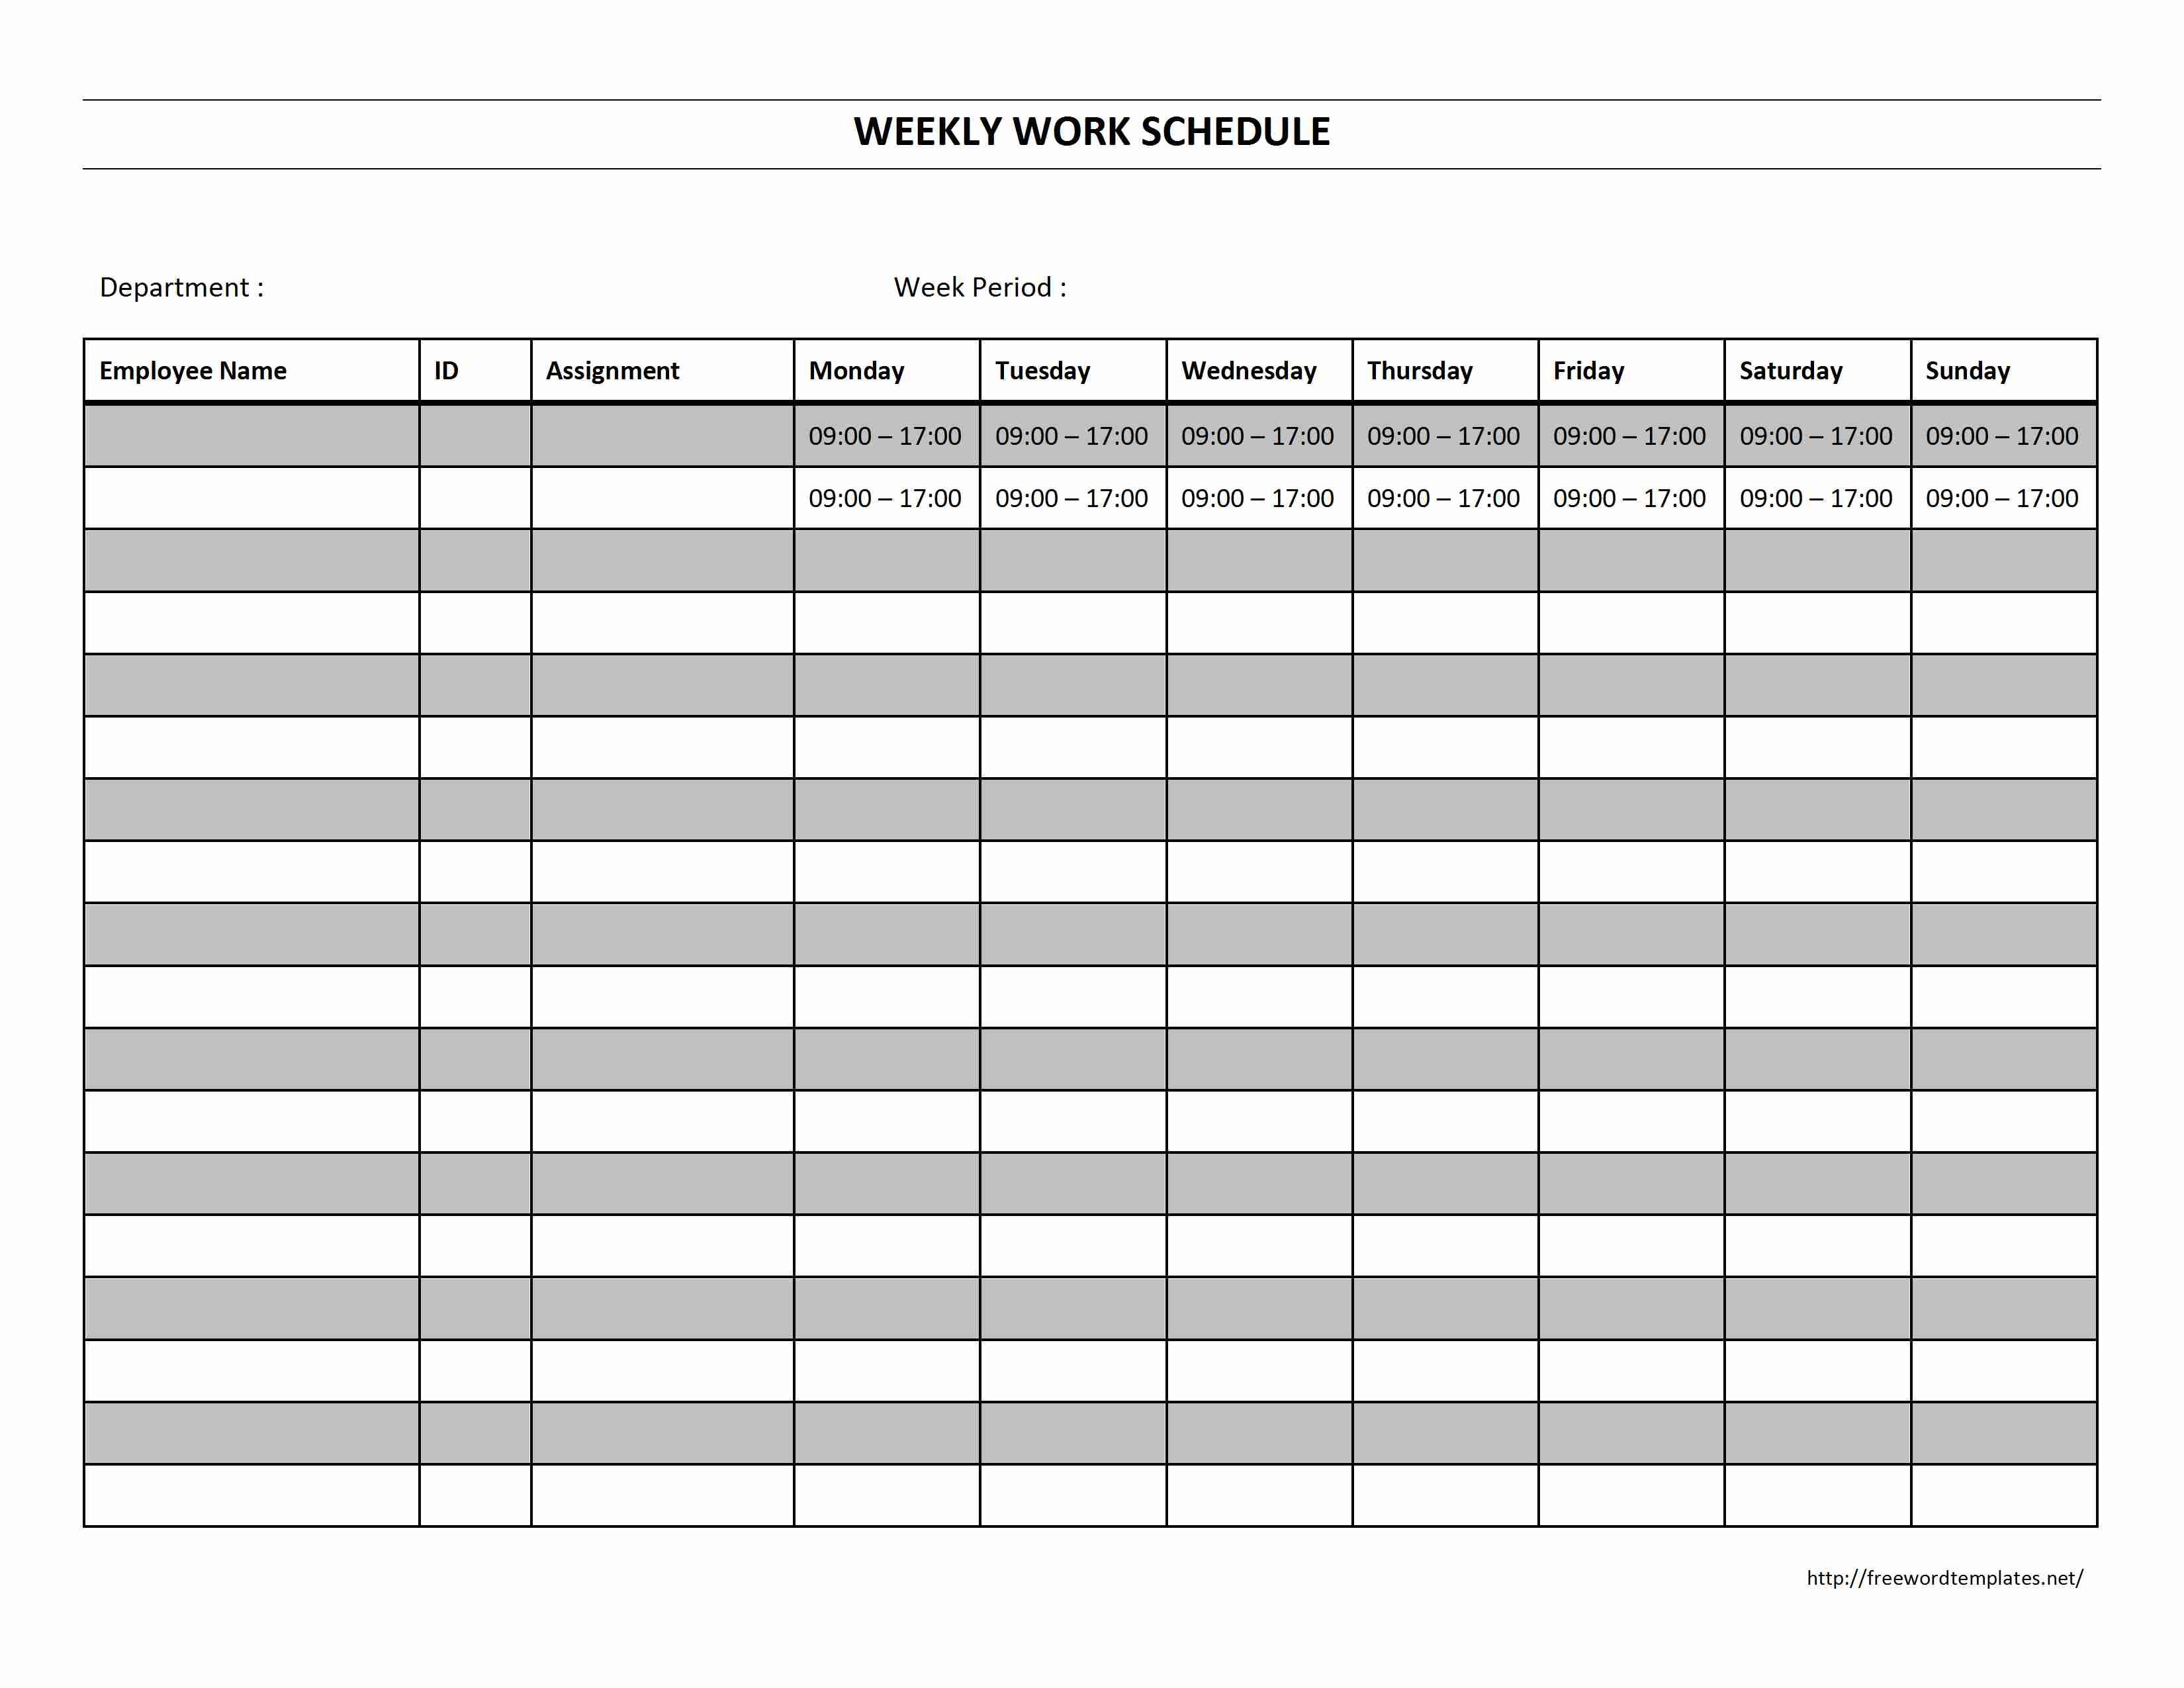 Schedule Template Monthly Work Ar Employee Scheduling | Smorad